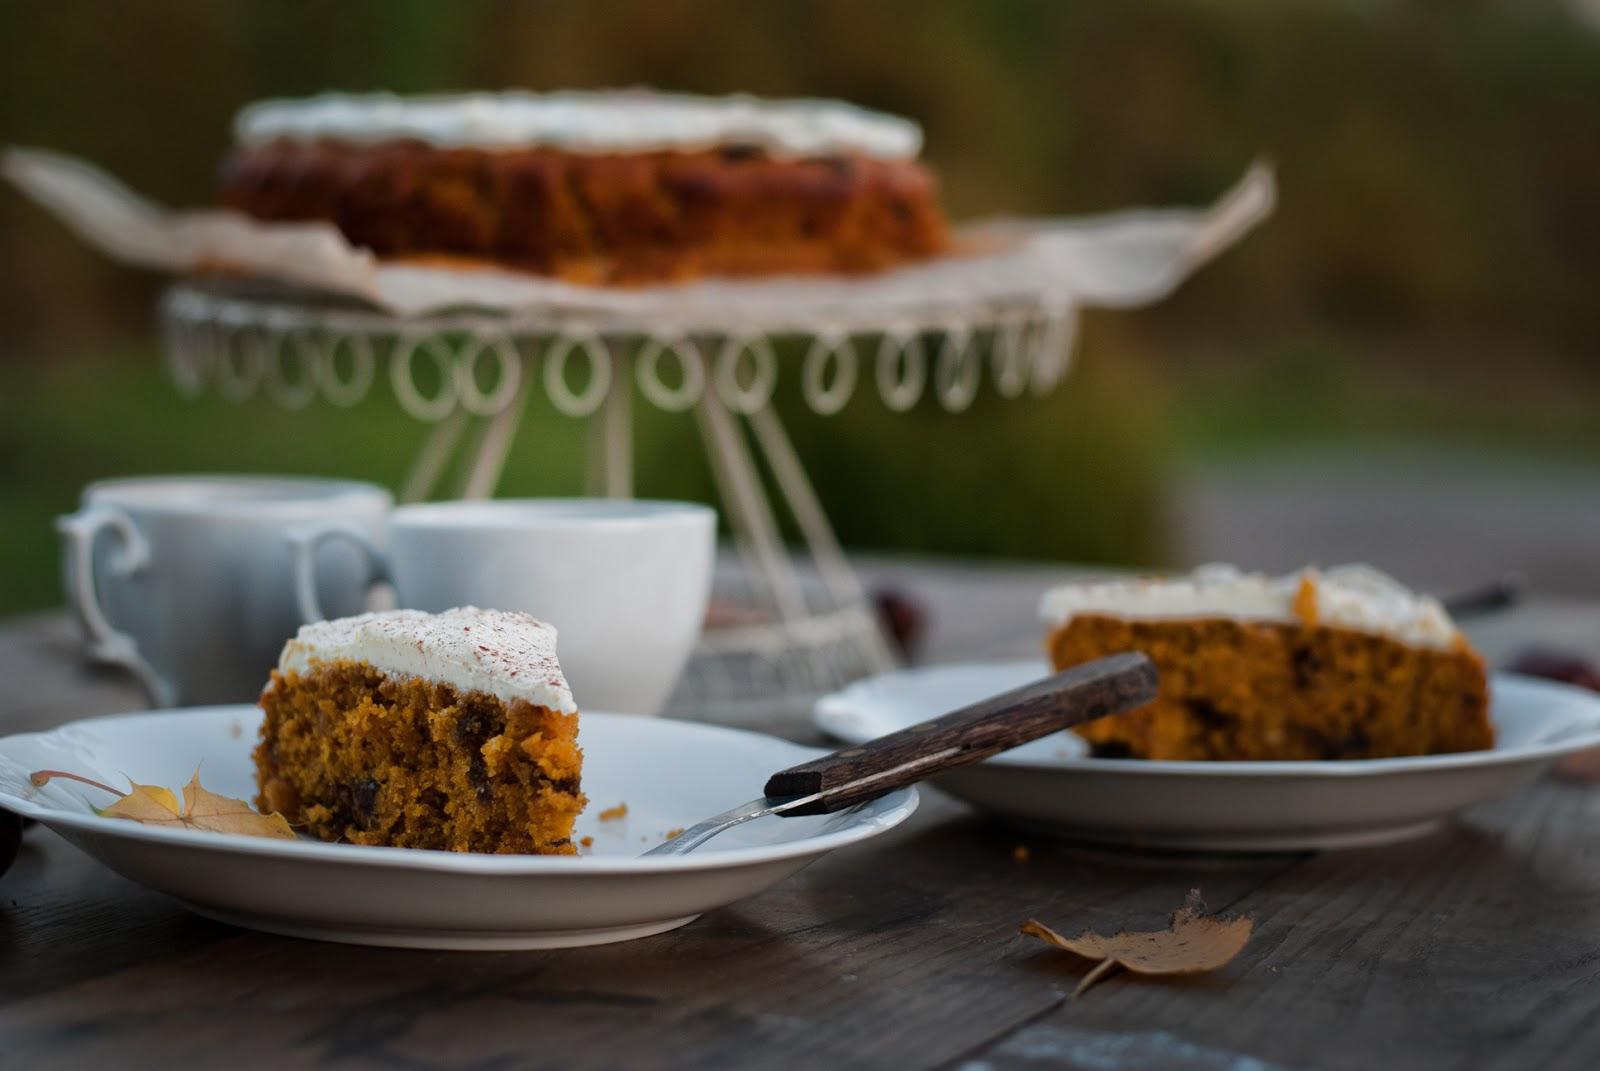 Ciasto dyniowe z bakaliami i kremem